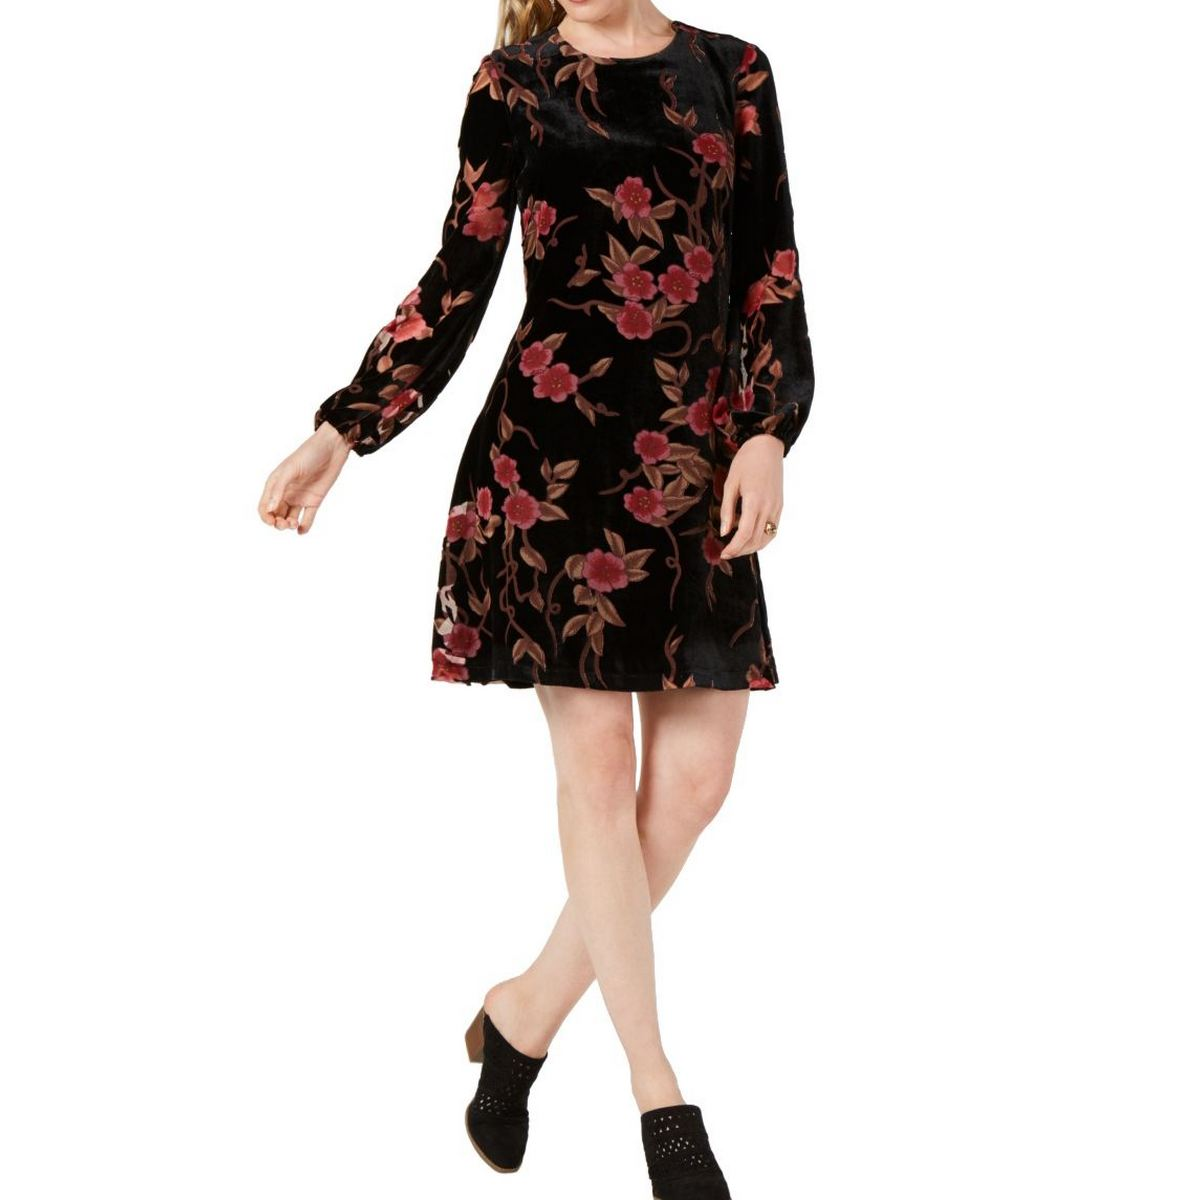 ALFANI NEW Women/'s Teal Pleat-front Circle Print A-line Dress 14 TEDO